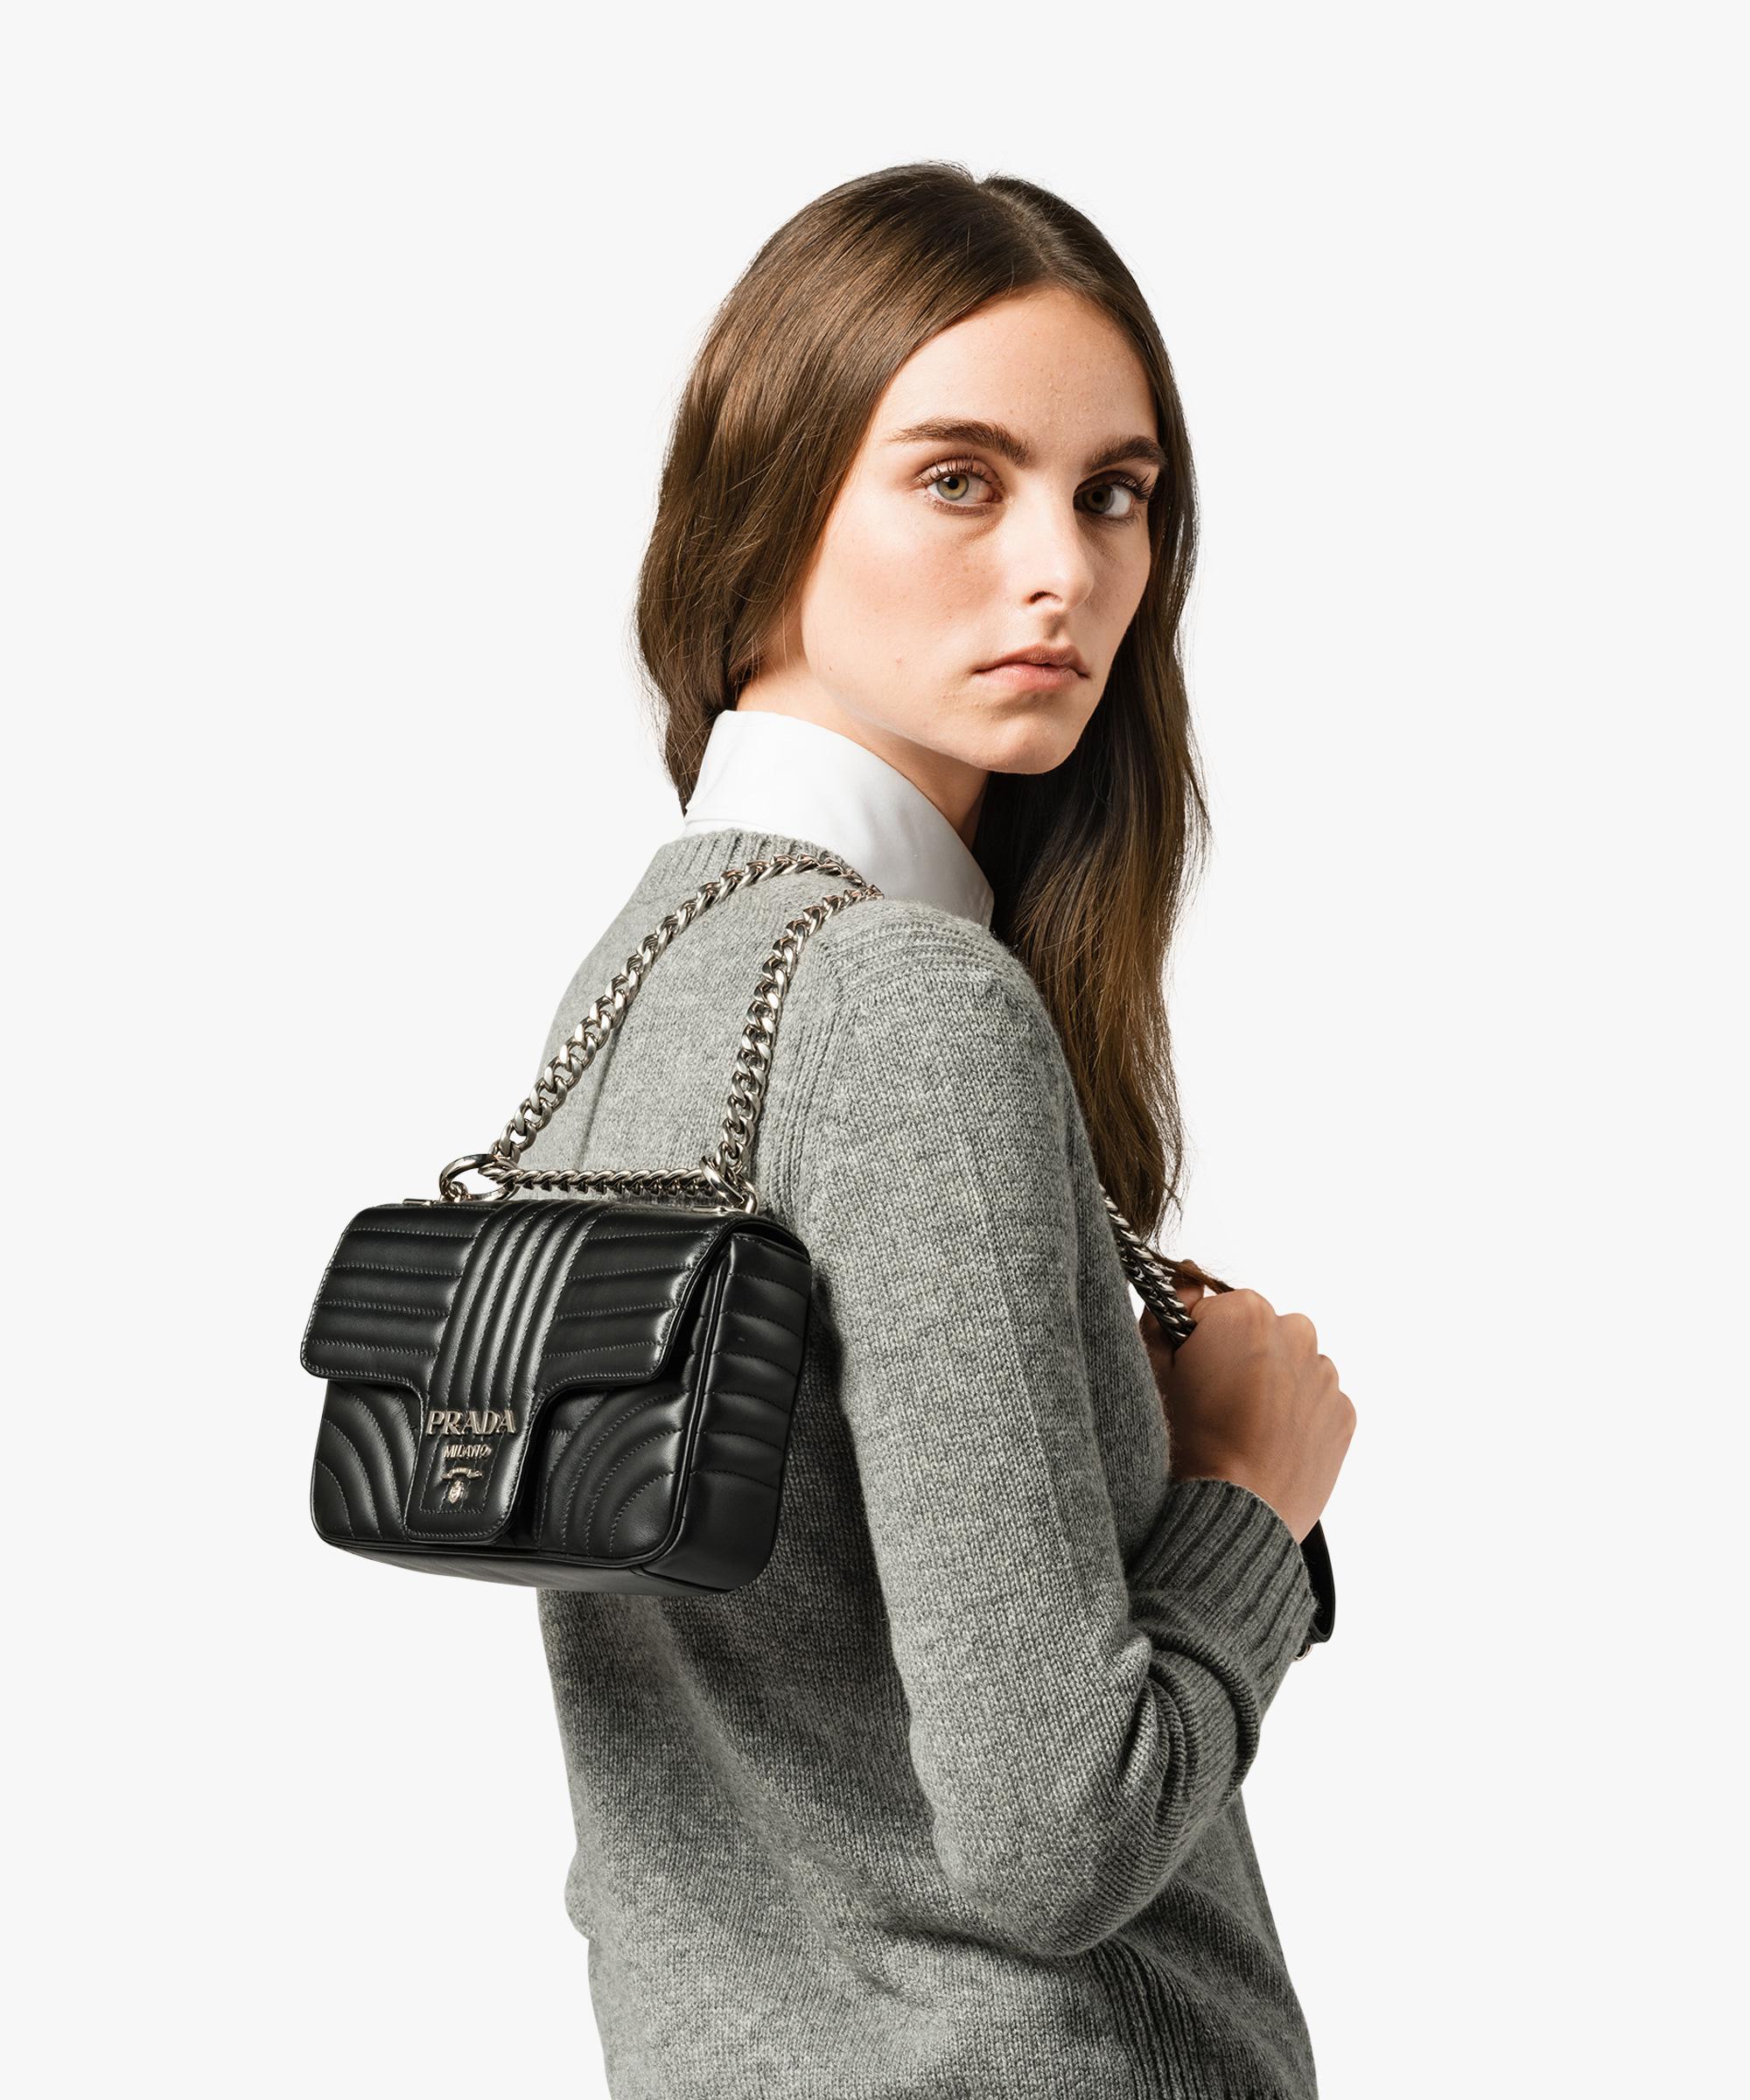 b1942fe884d80e Prada Diagramme Leather Shoulder Bag in Black - Lyst